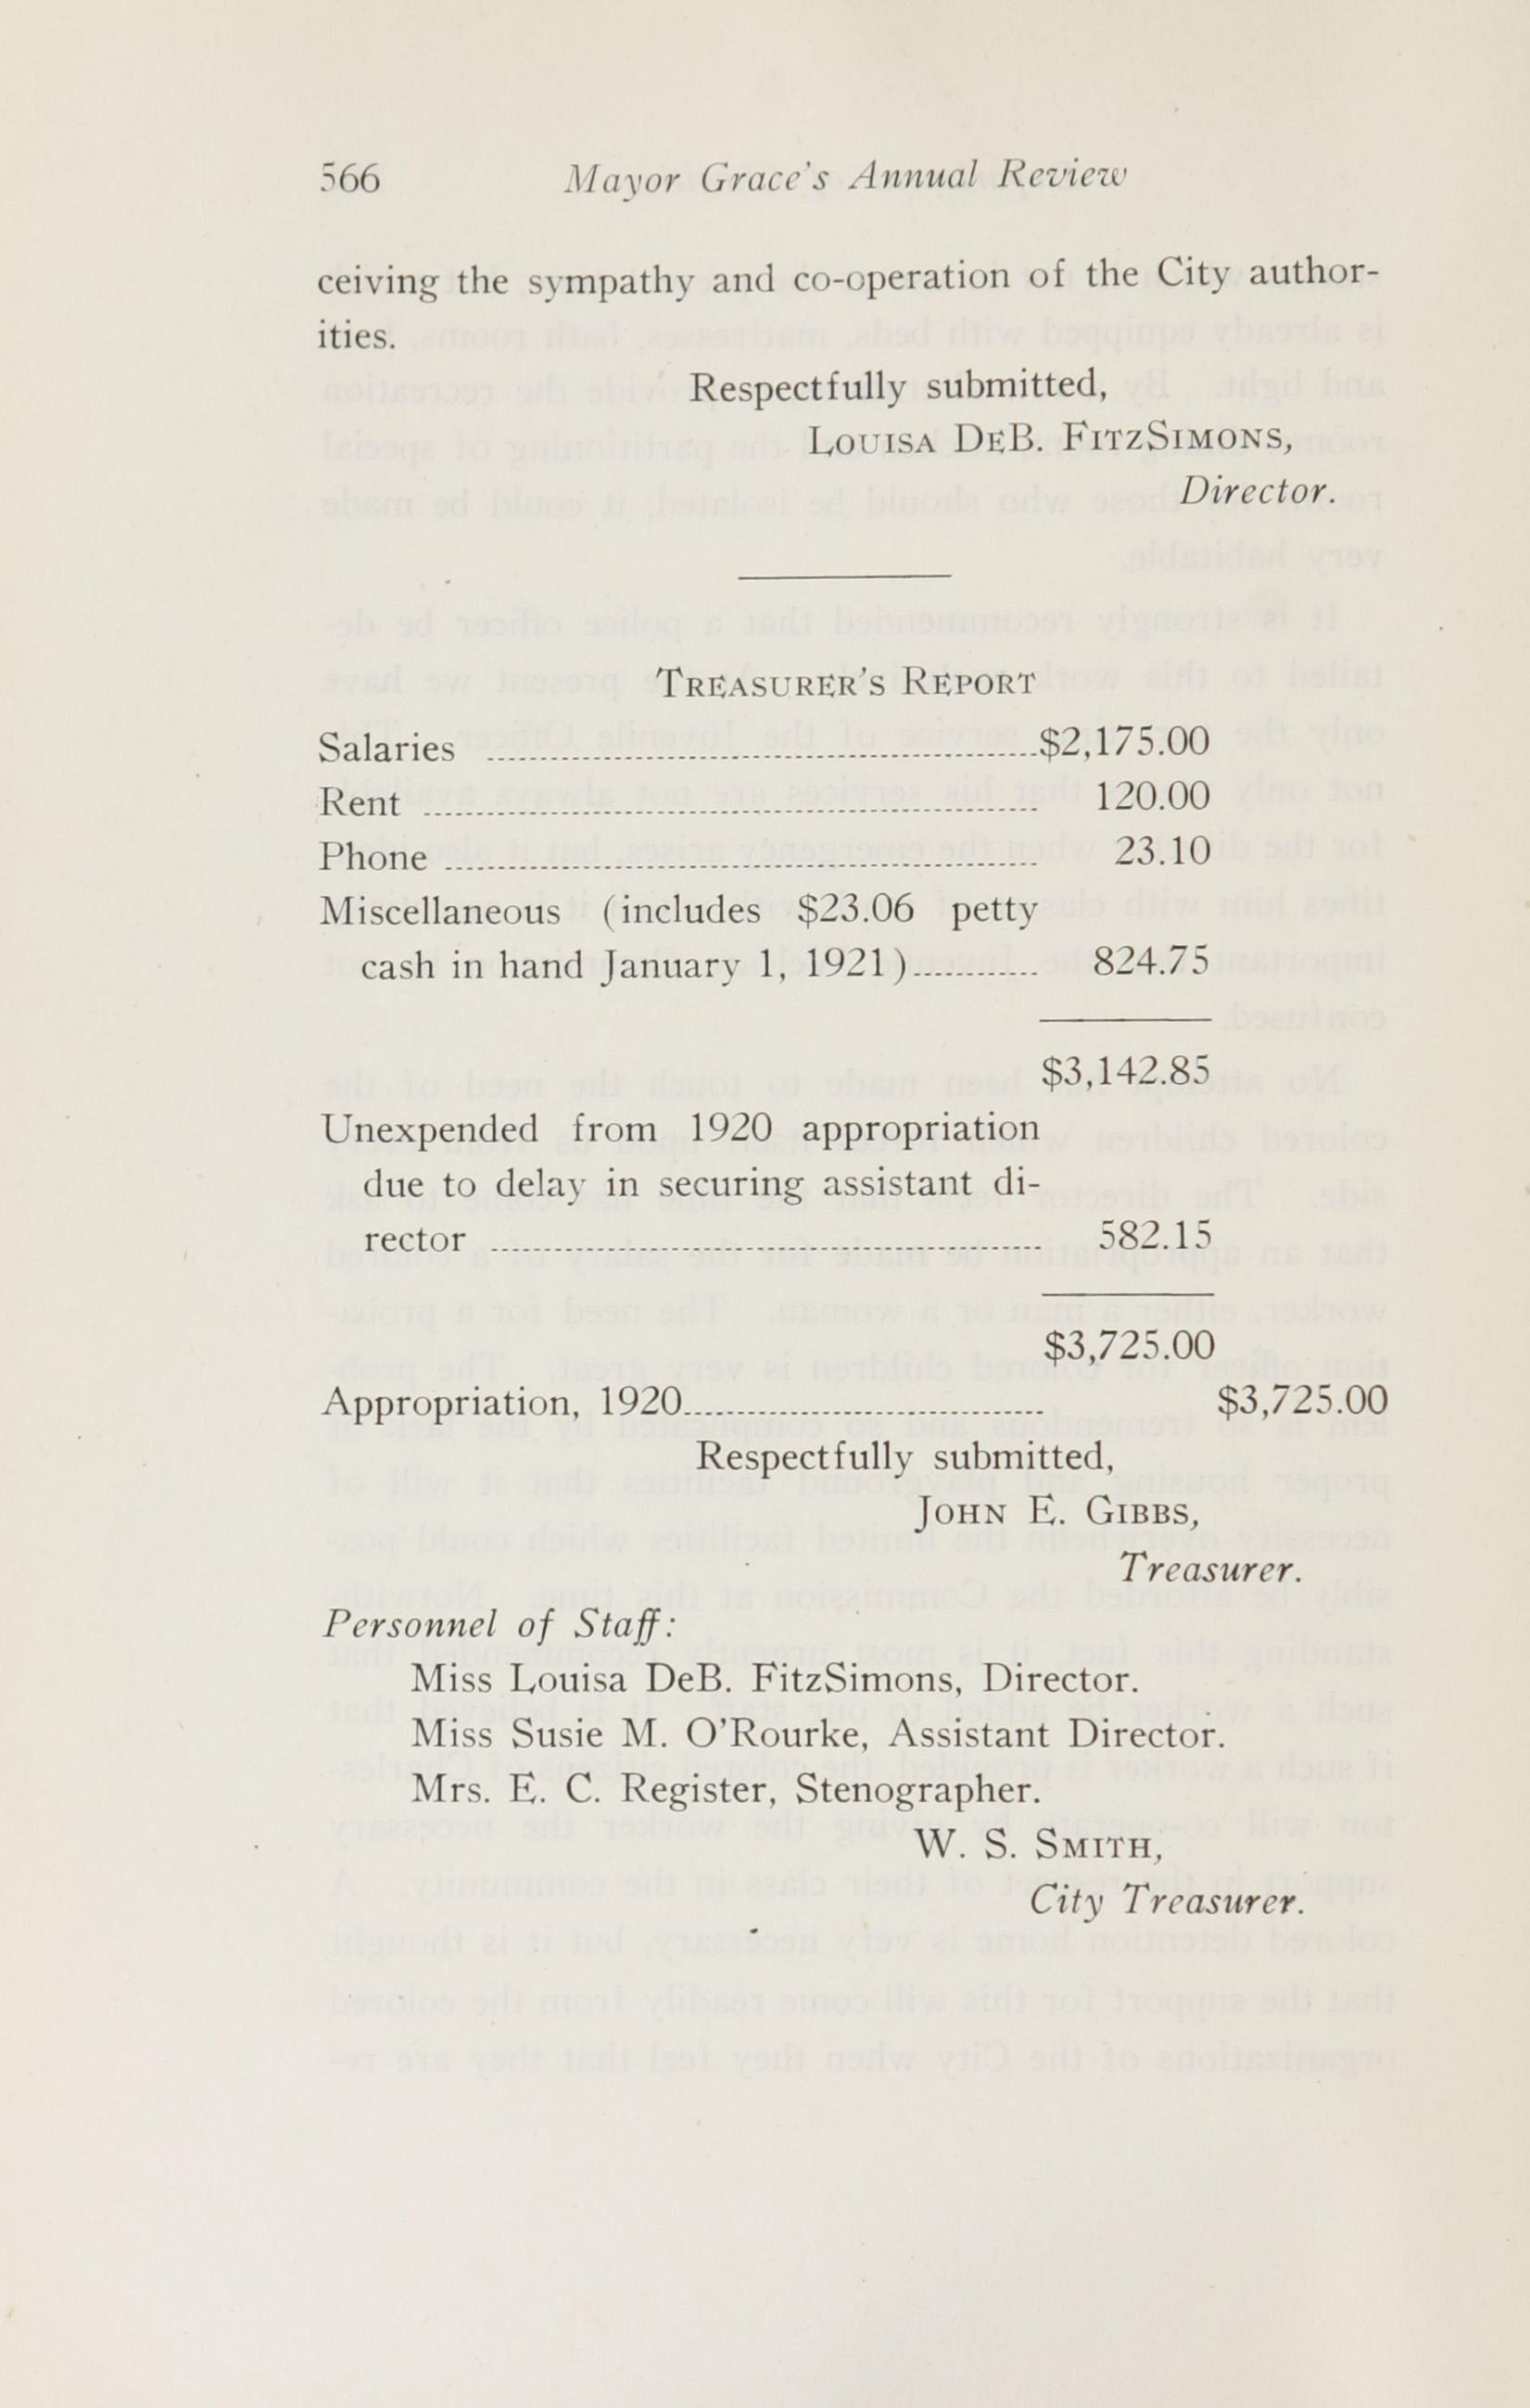 Charleston Yearbook, 1920, page 566